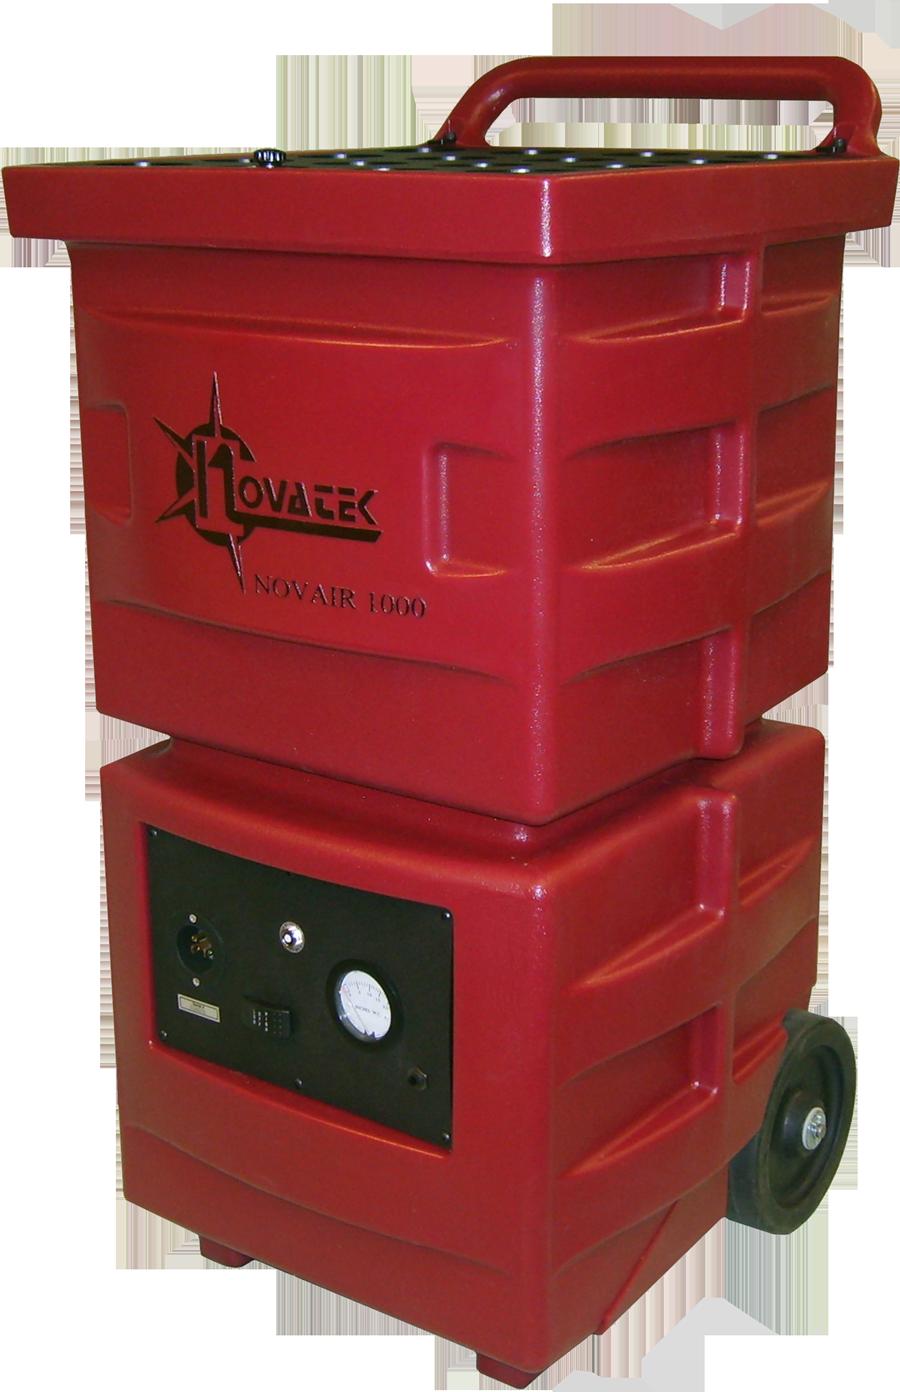 Novatek Novair 1000 Portable Air Filtration System